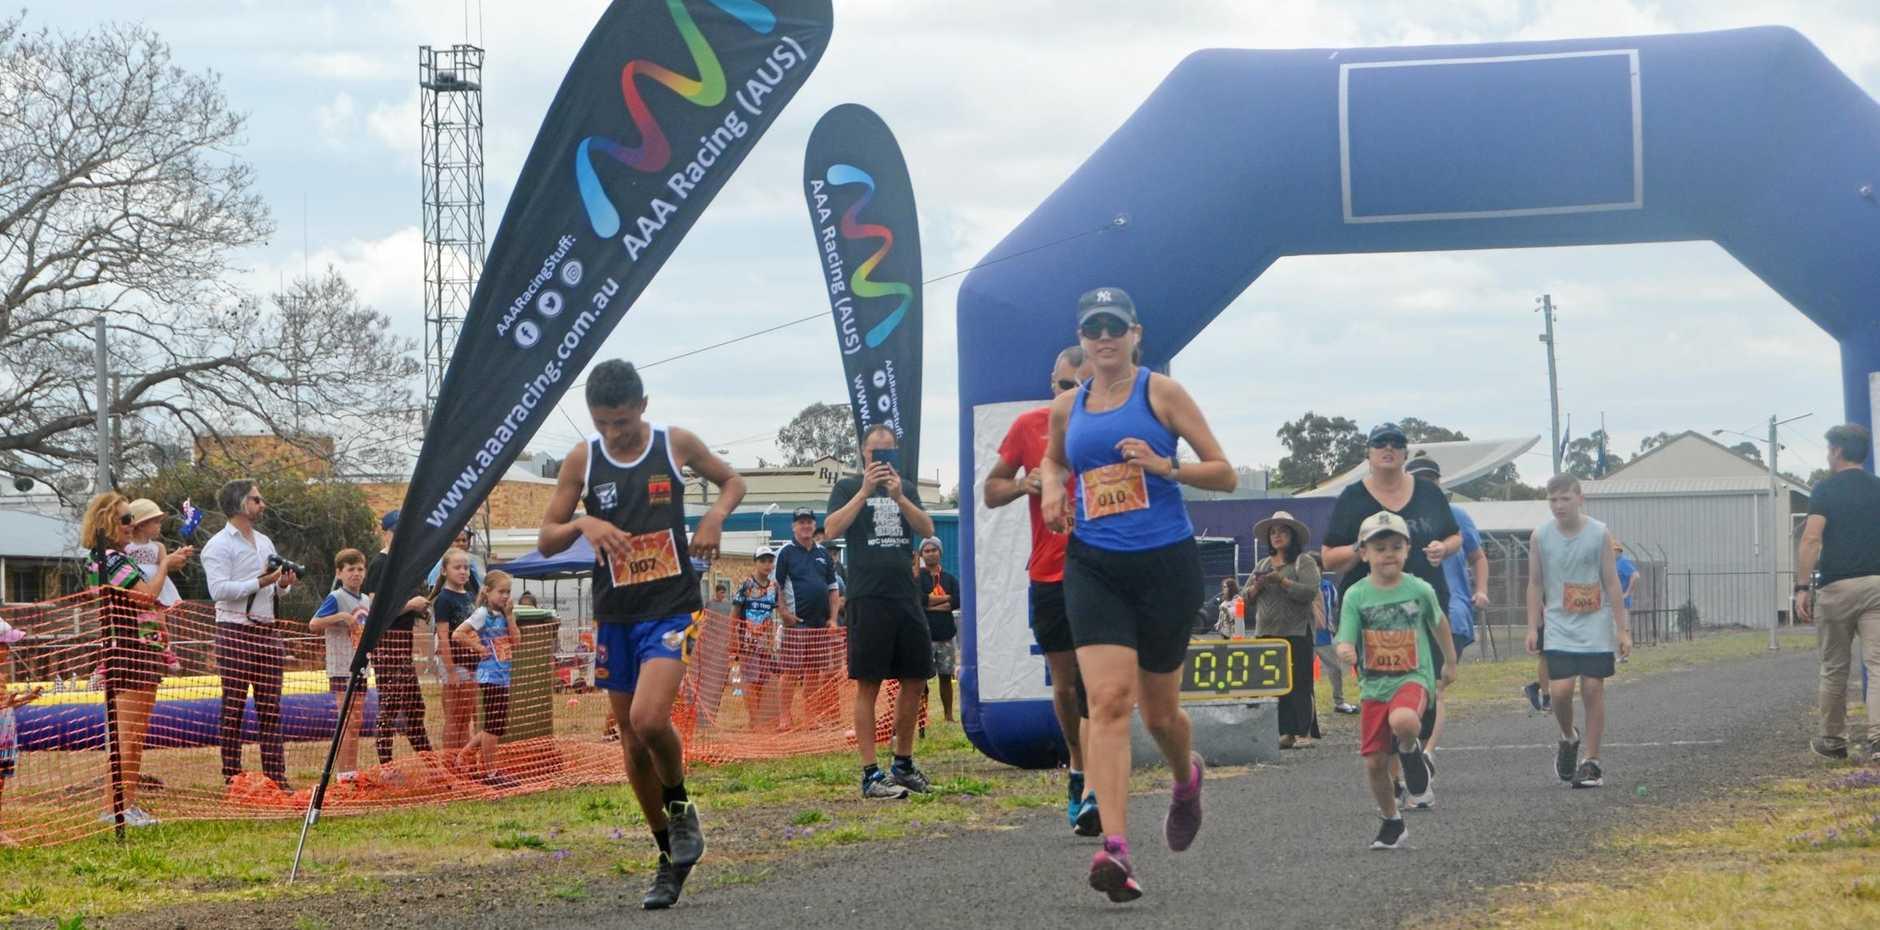 The start of the 5km race at the Murgon marathon running festival.